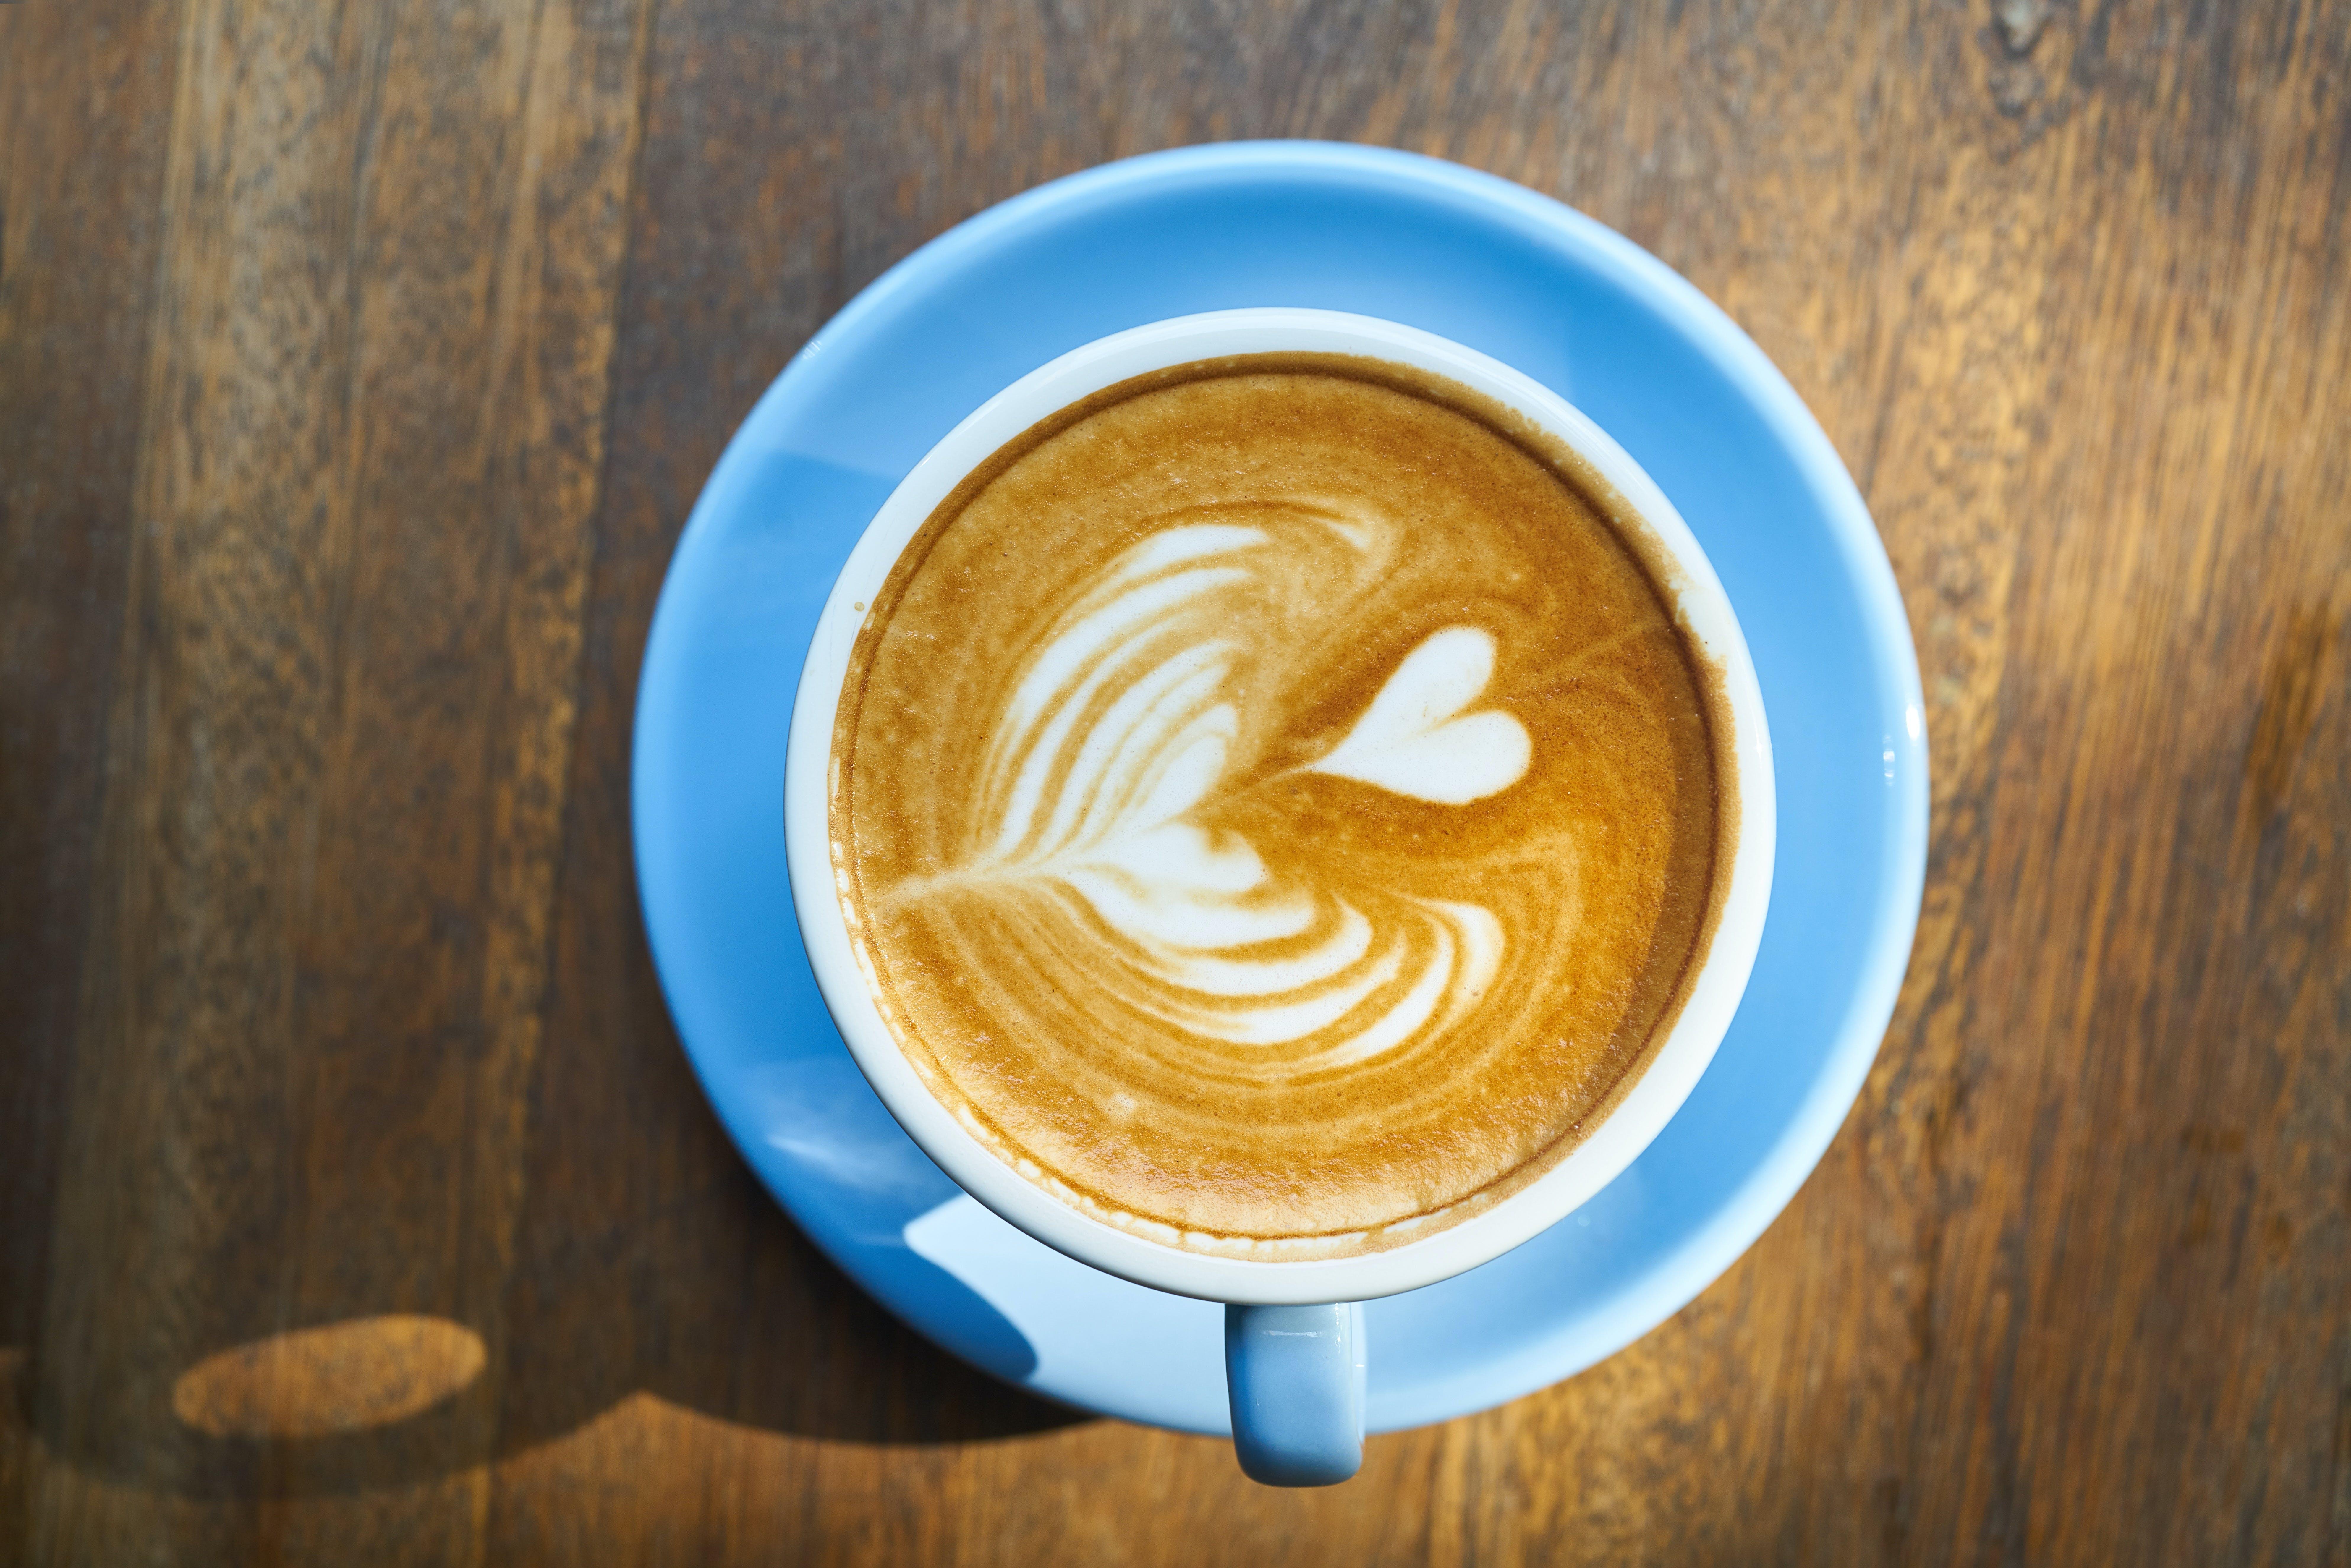 Blue Ceramic Coffee Mug on Saucer